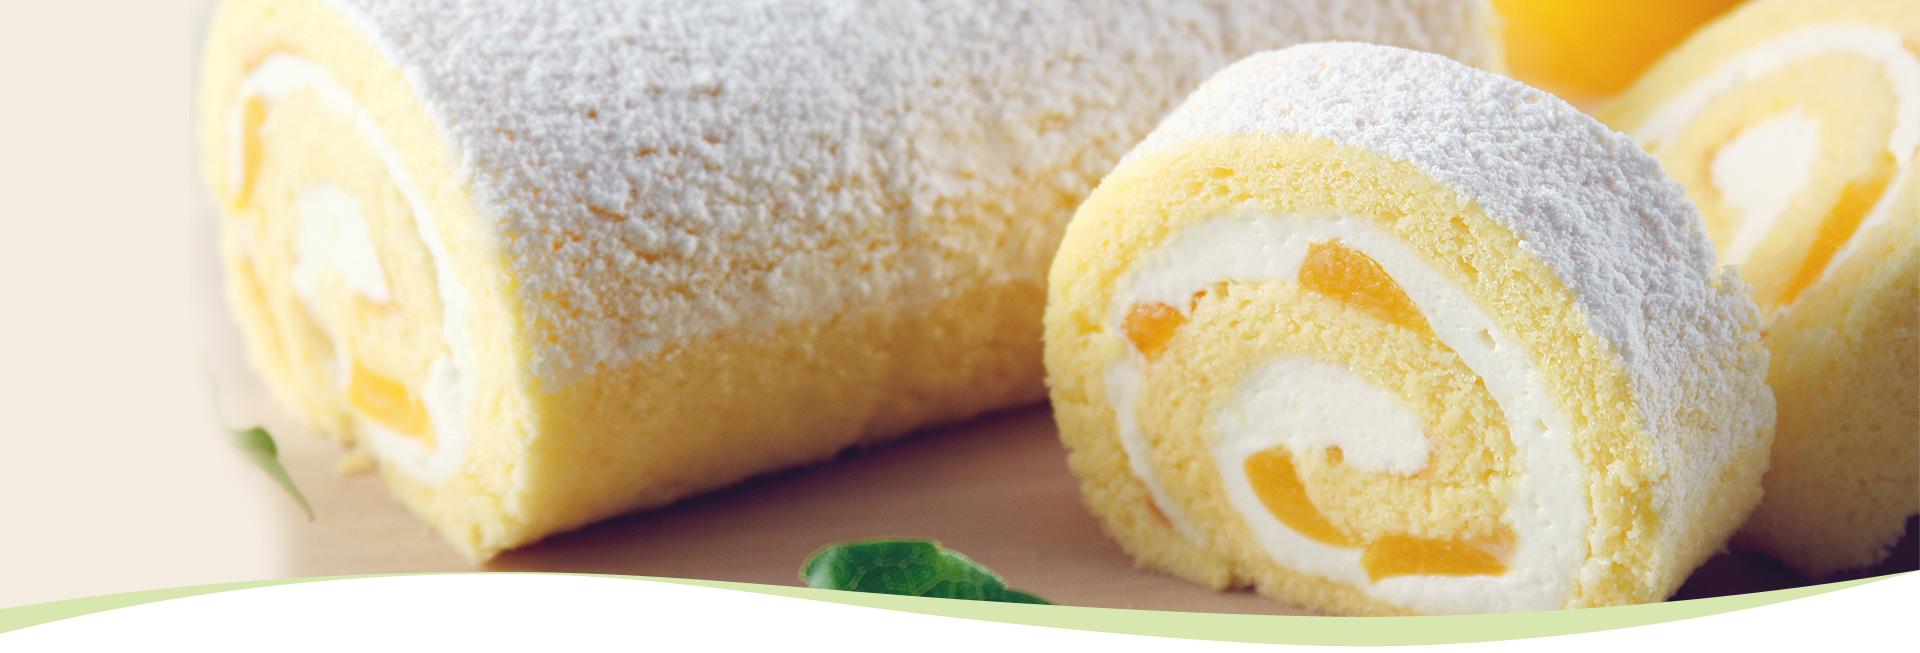 珠屋洋菓子店Onlineshop